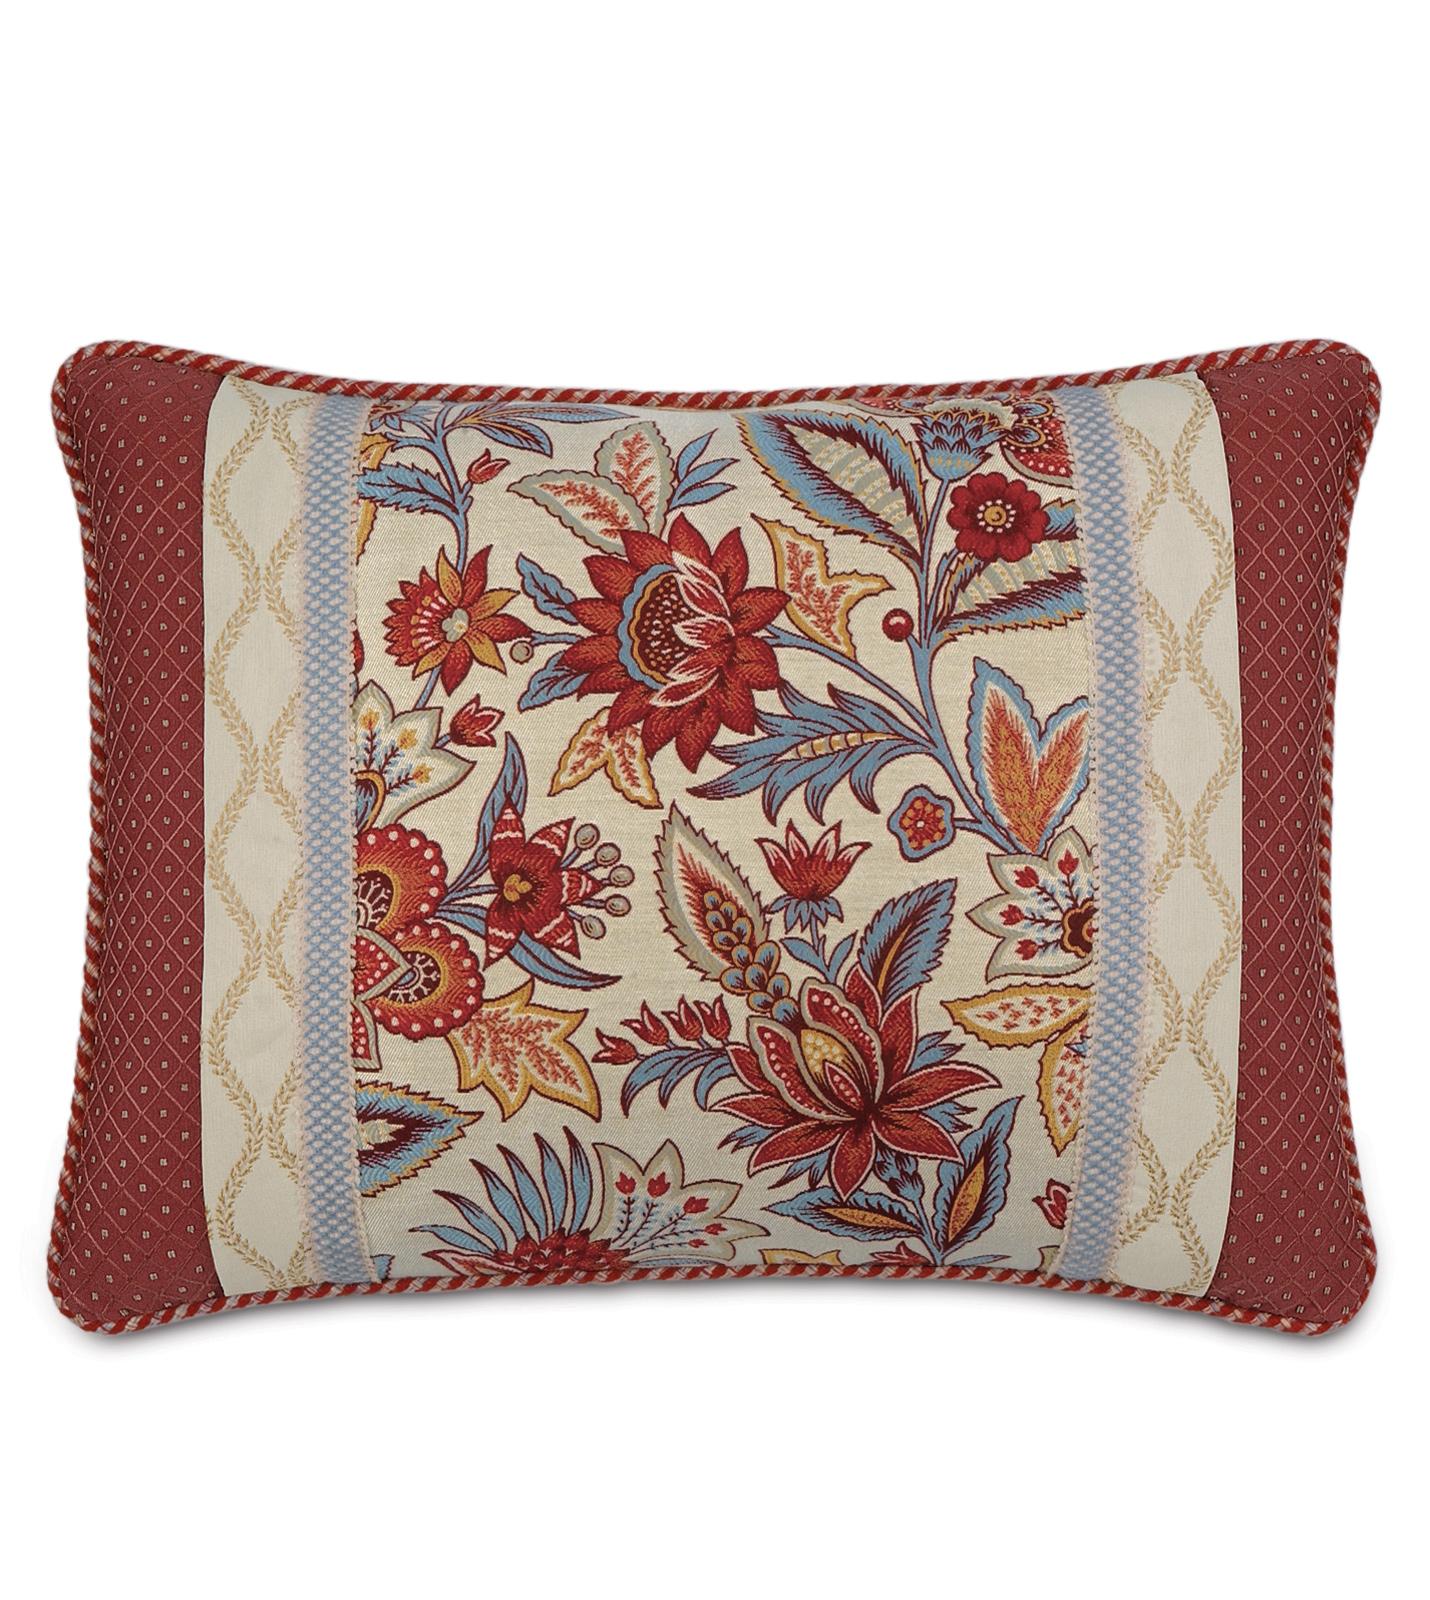 Standard Throw Pillow Inserts : Luxury Bedding by Eastern Accents - CORINNE INSERT STANDARD SHAM